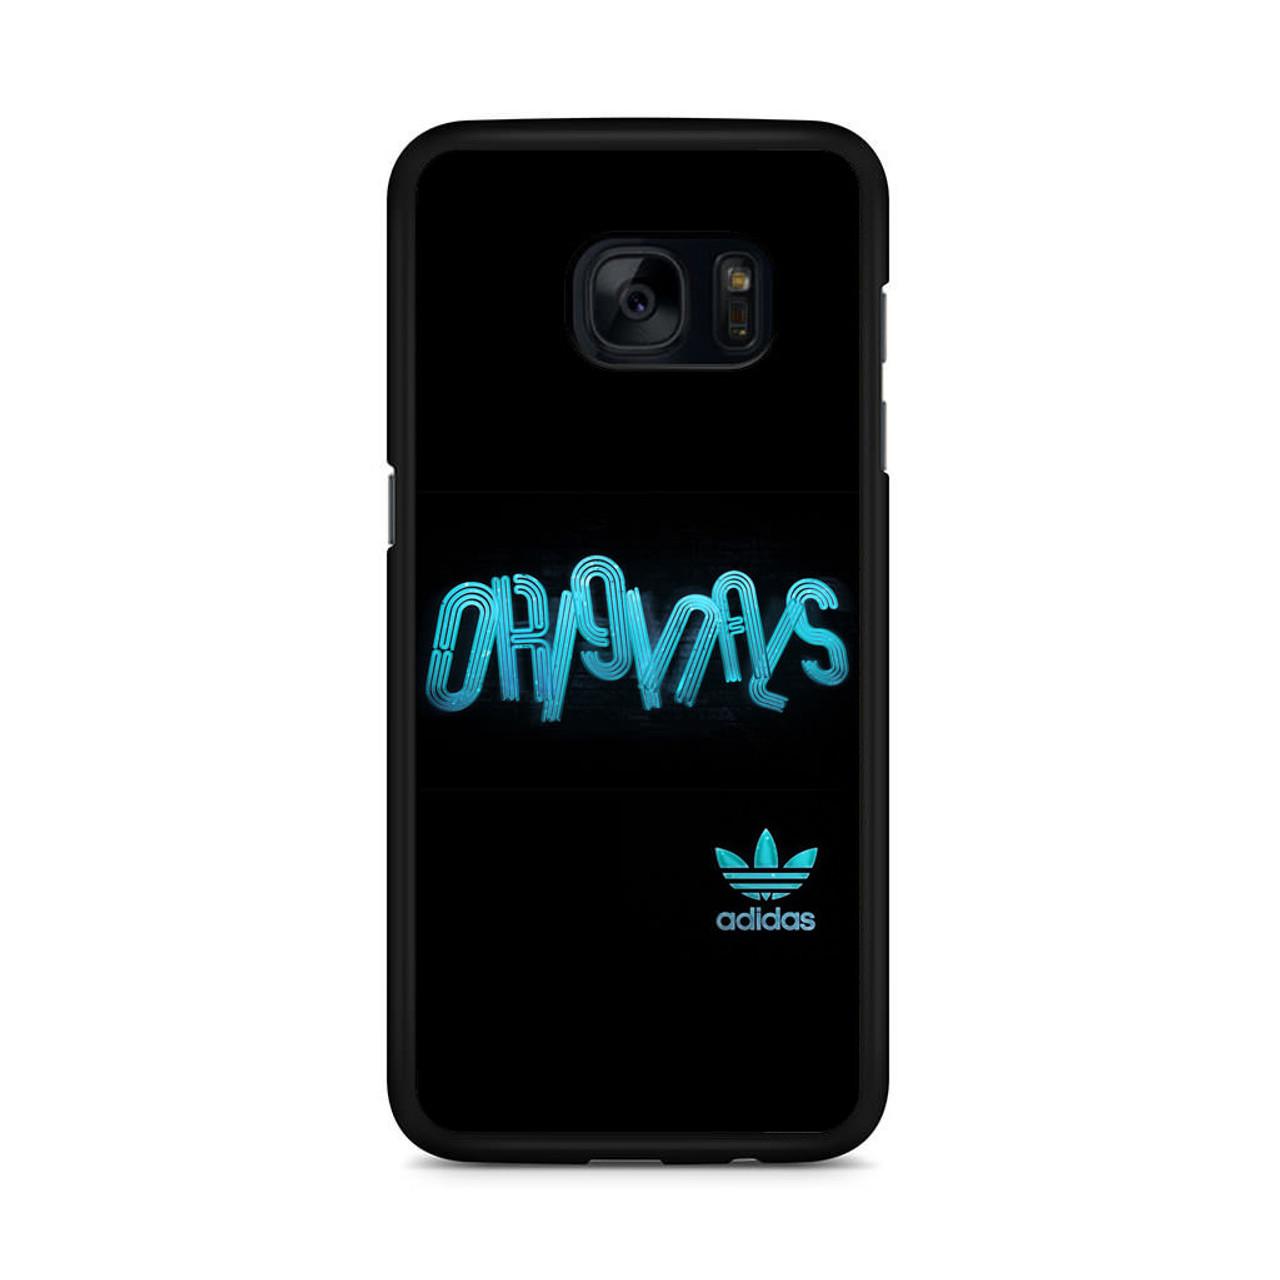 new product 2adfa 37cfd Adidas Originals Samsung Galaxy S7 Edge Case